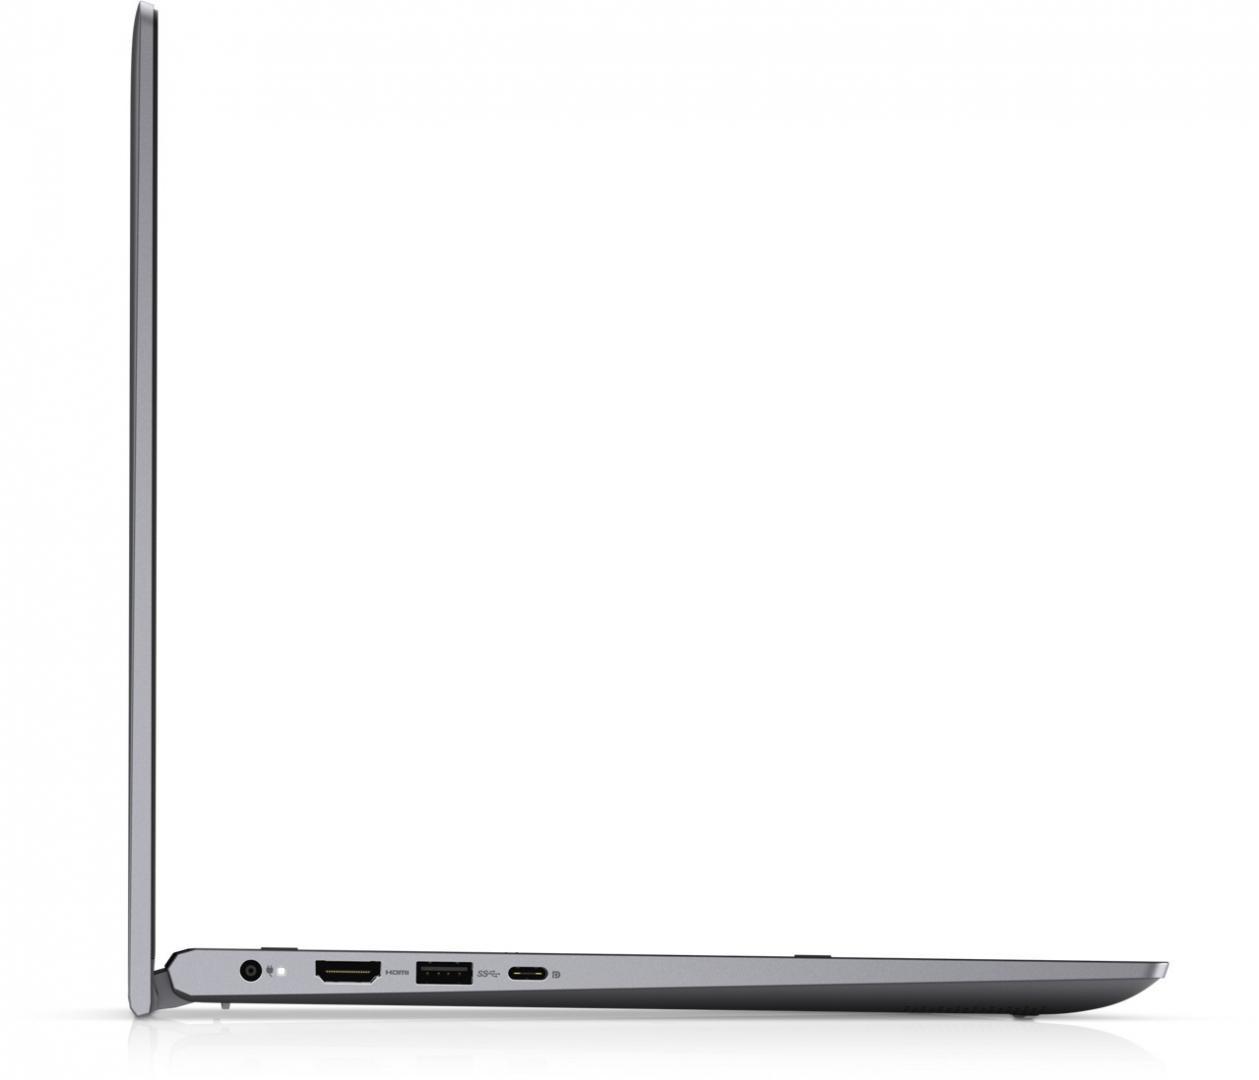 "Laptop Dell Inspiron 5406 2in1, 14.0"" FHD, Touch, i5-1135G7, 8GB, 256GB SSD, Intel Iris Xe Graphics, W10 Pro - imaginea 8"